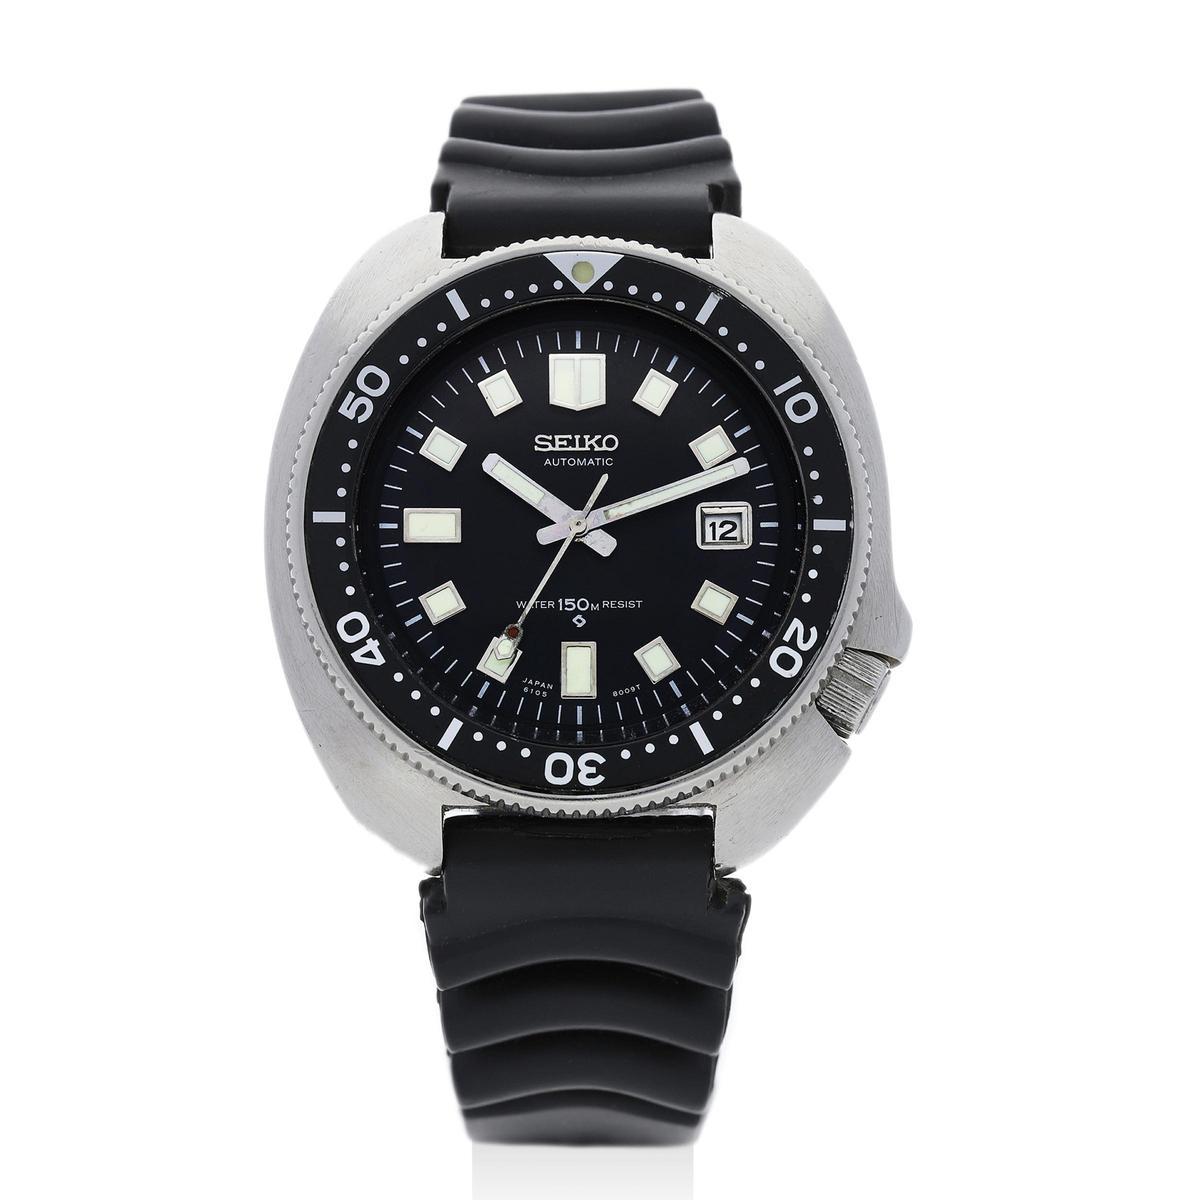 SEIKO「Diver's」6105-8119型號,約1969年出廠,預估拍價:4,000~8,000港元。